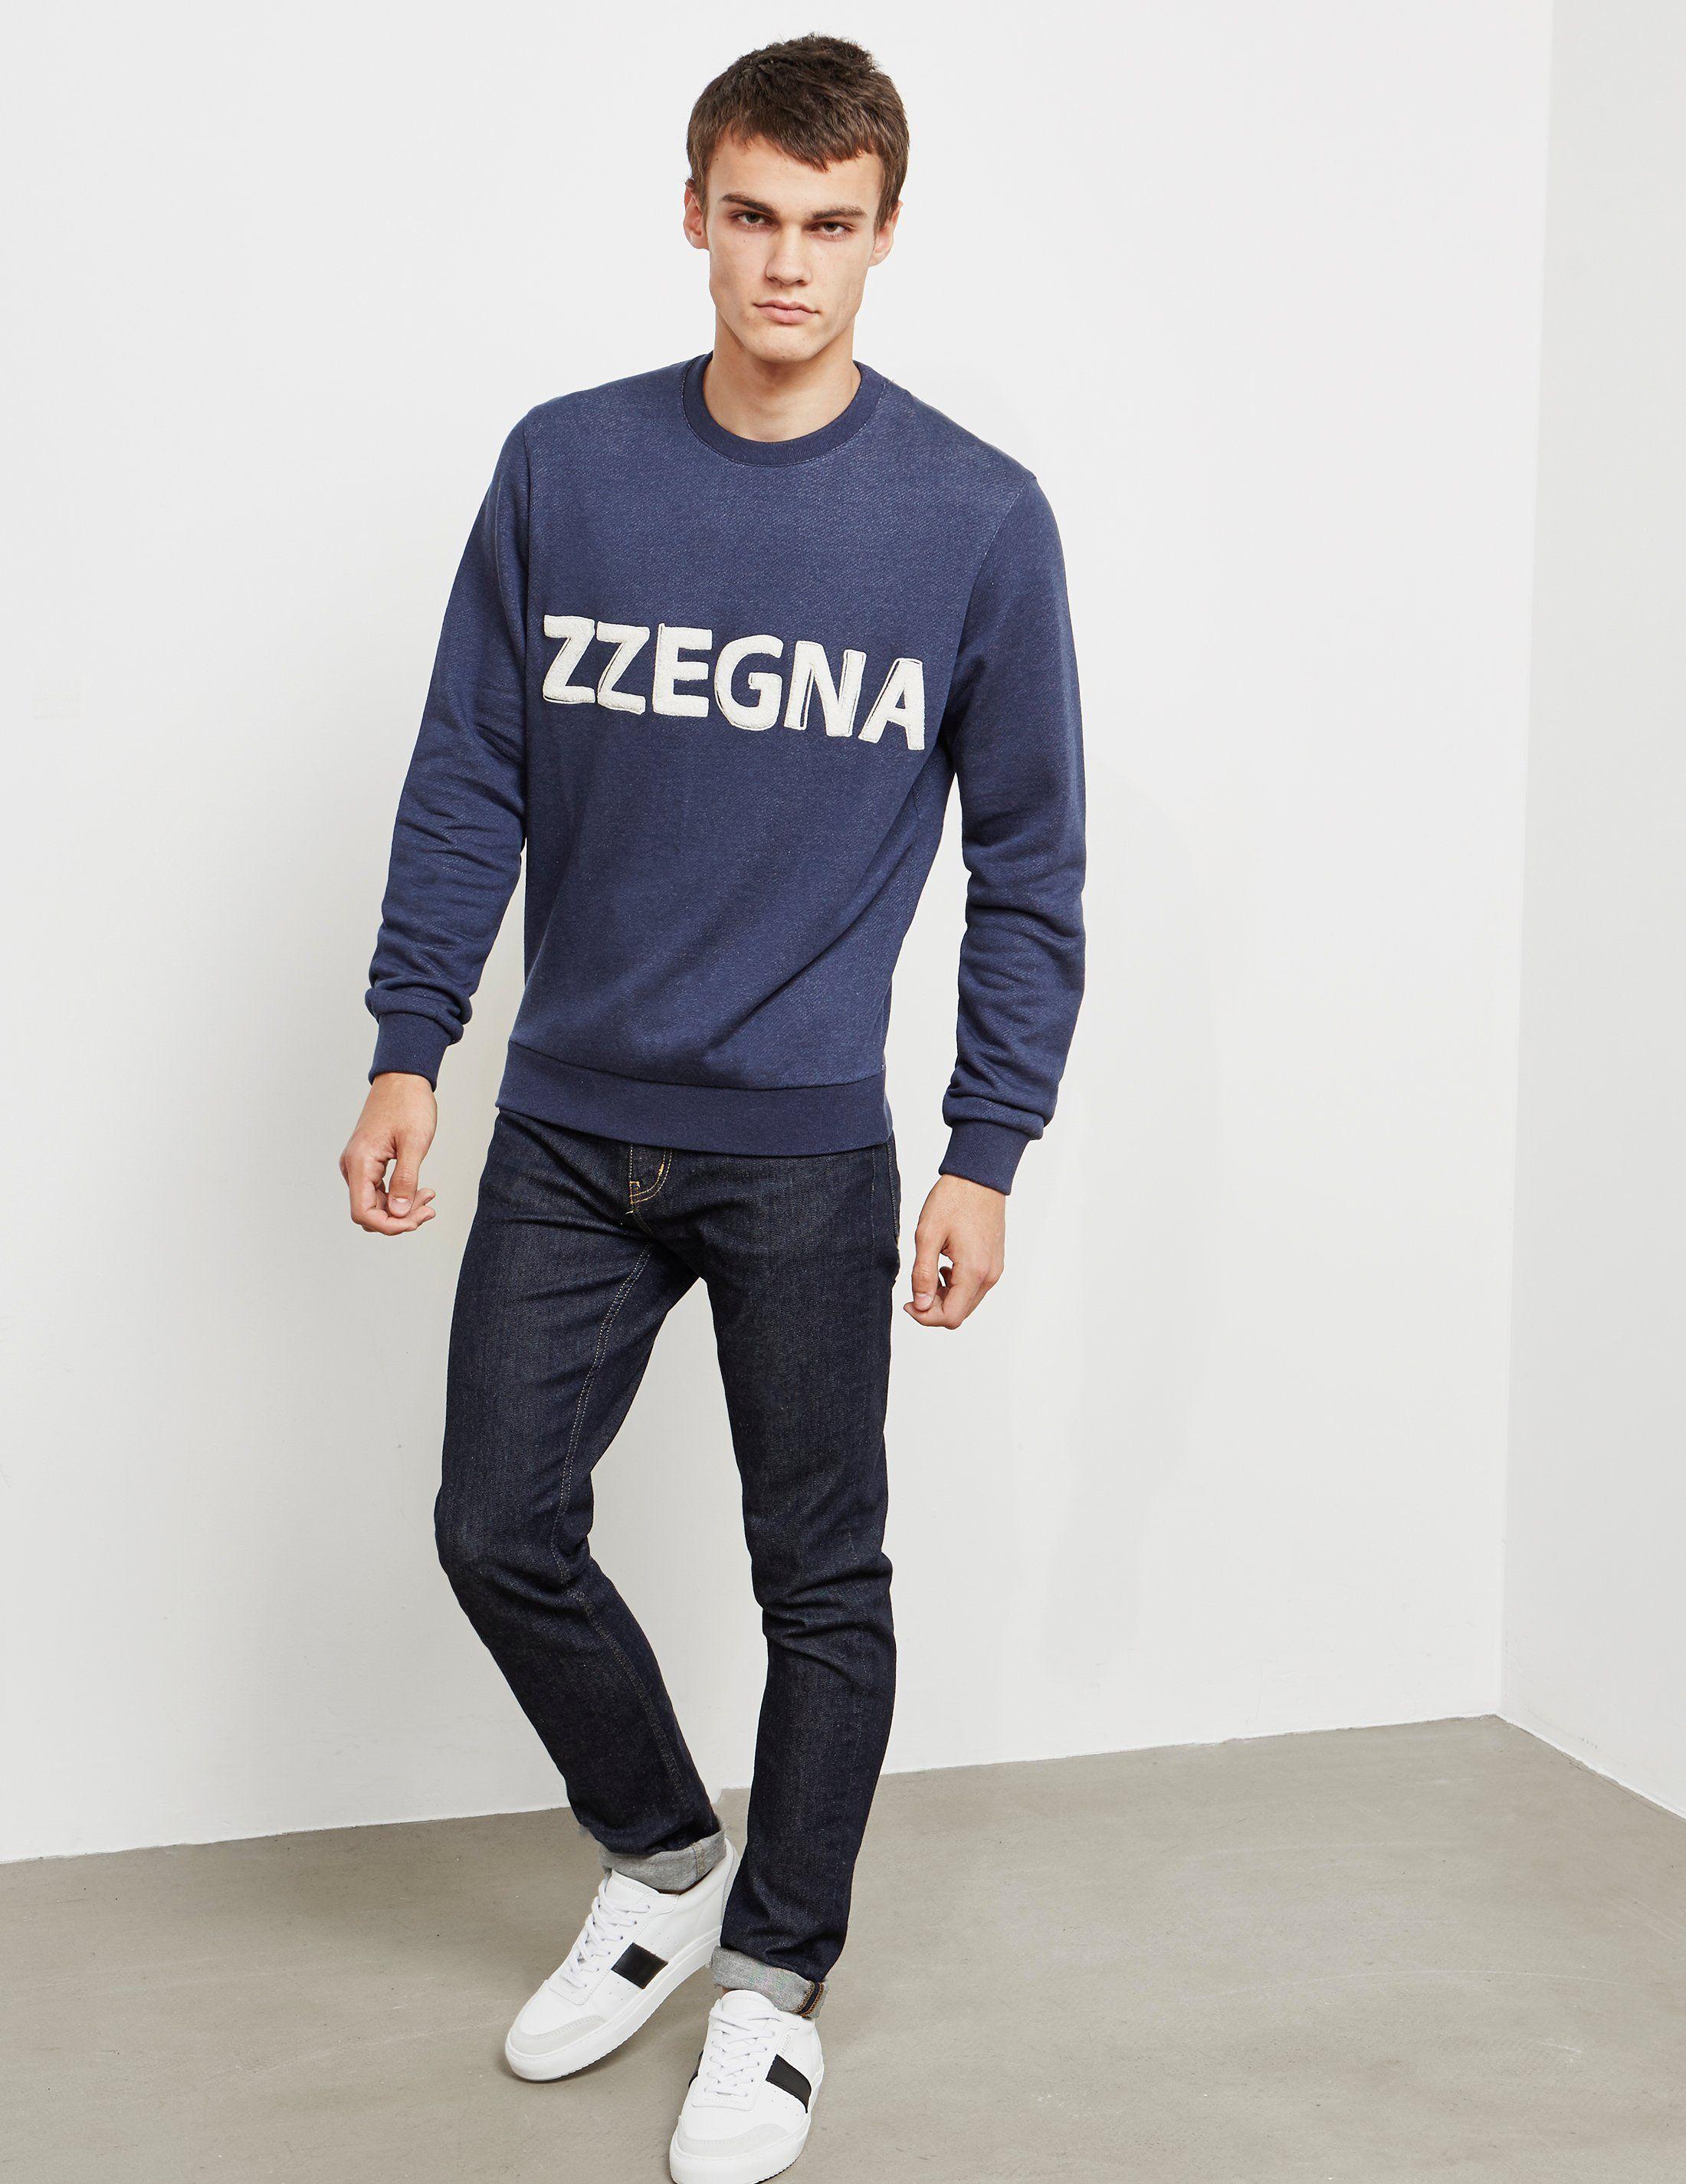 Z Zegna Flocked Logo Sweatshirt